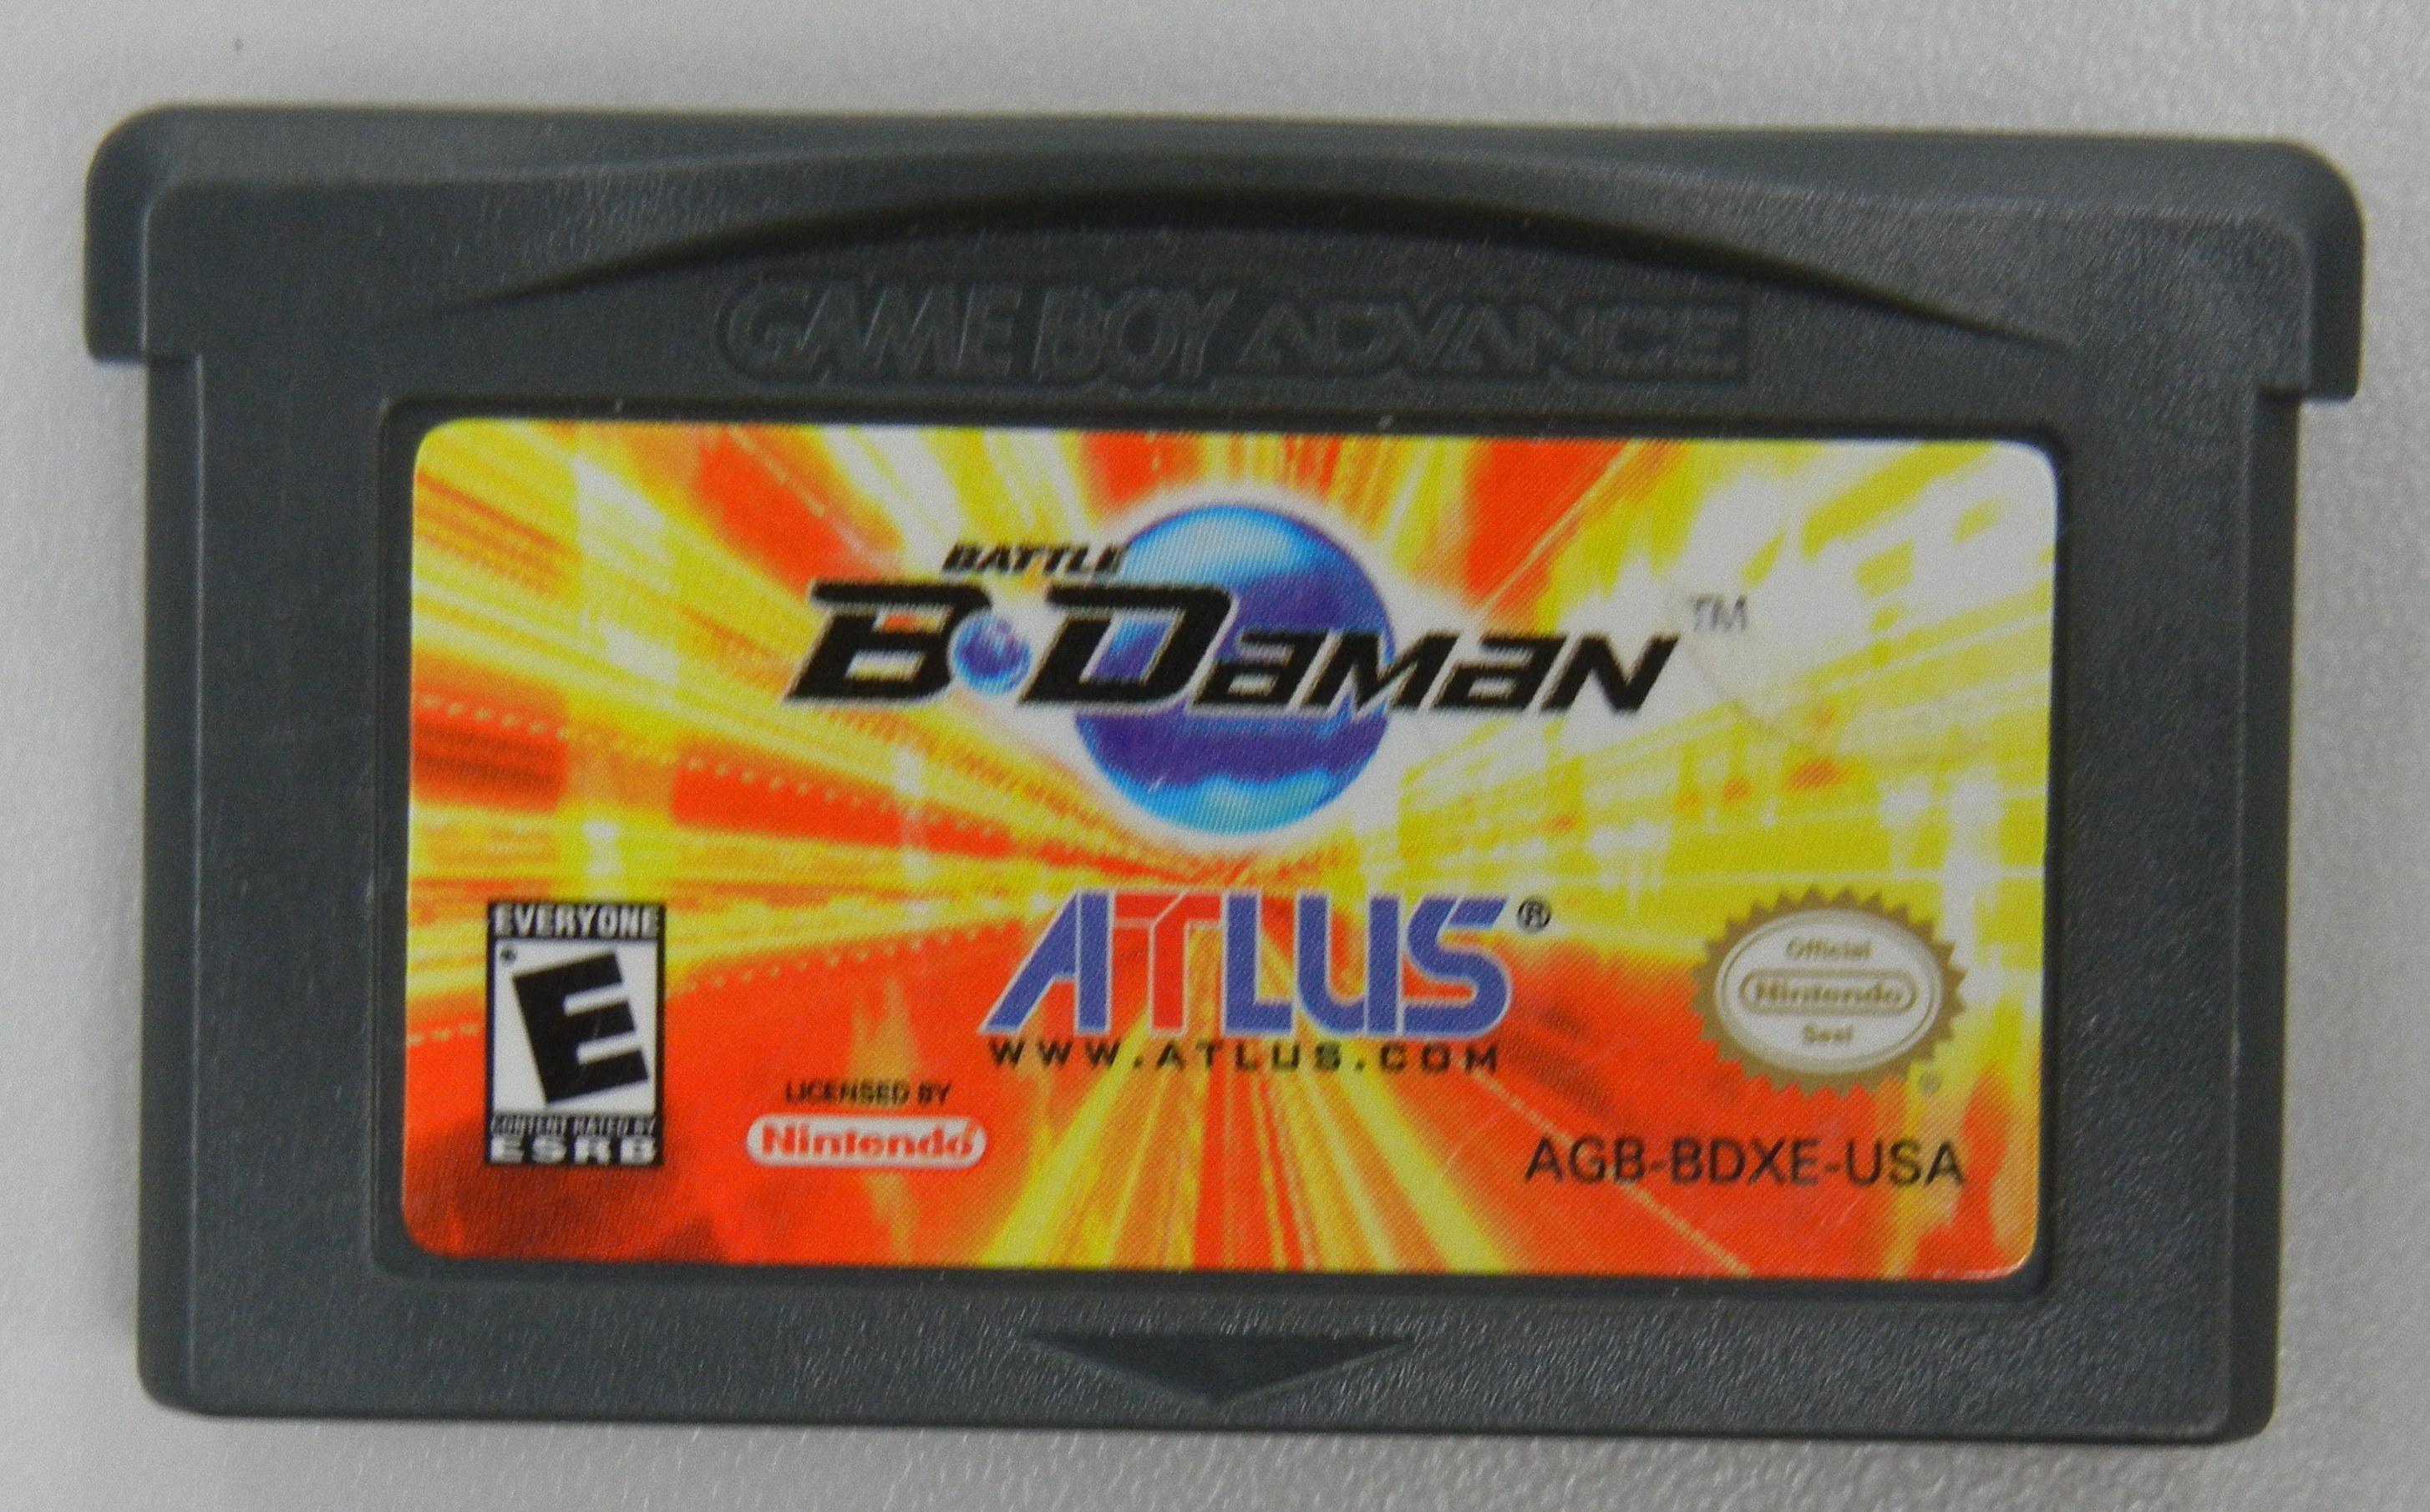 BATTLE B-DAMAN - GAMEBOY ADVANCE GAME